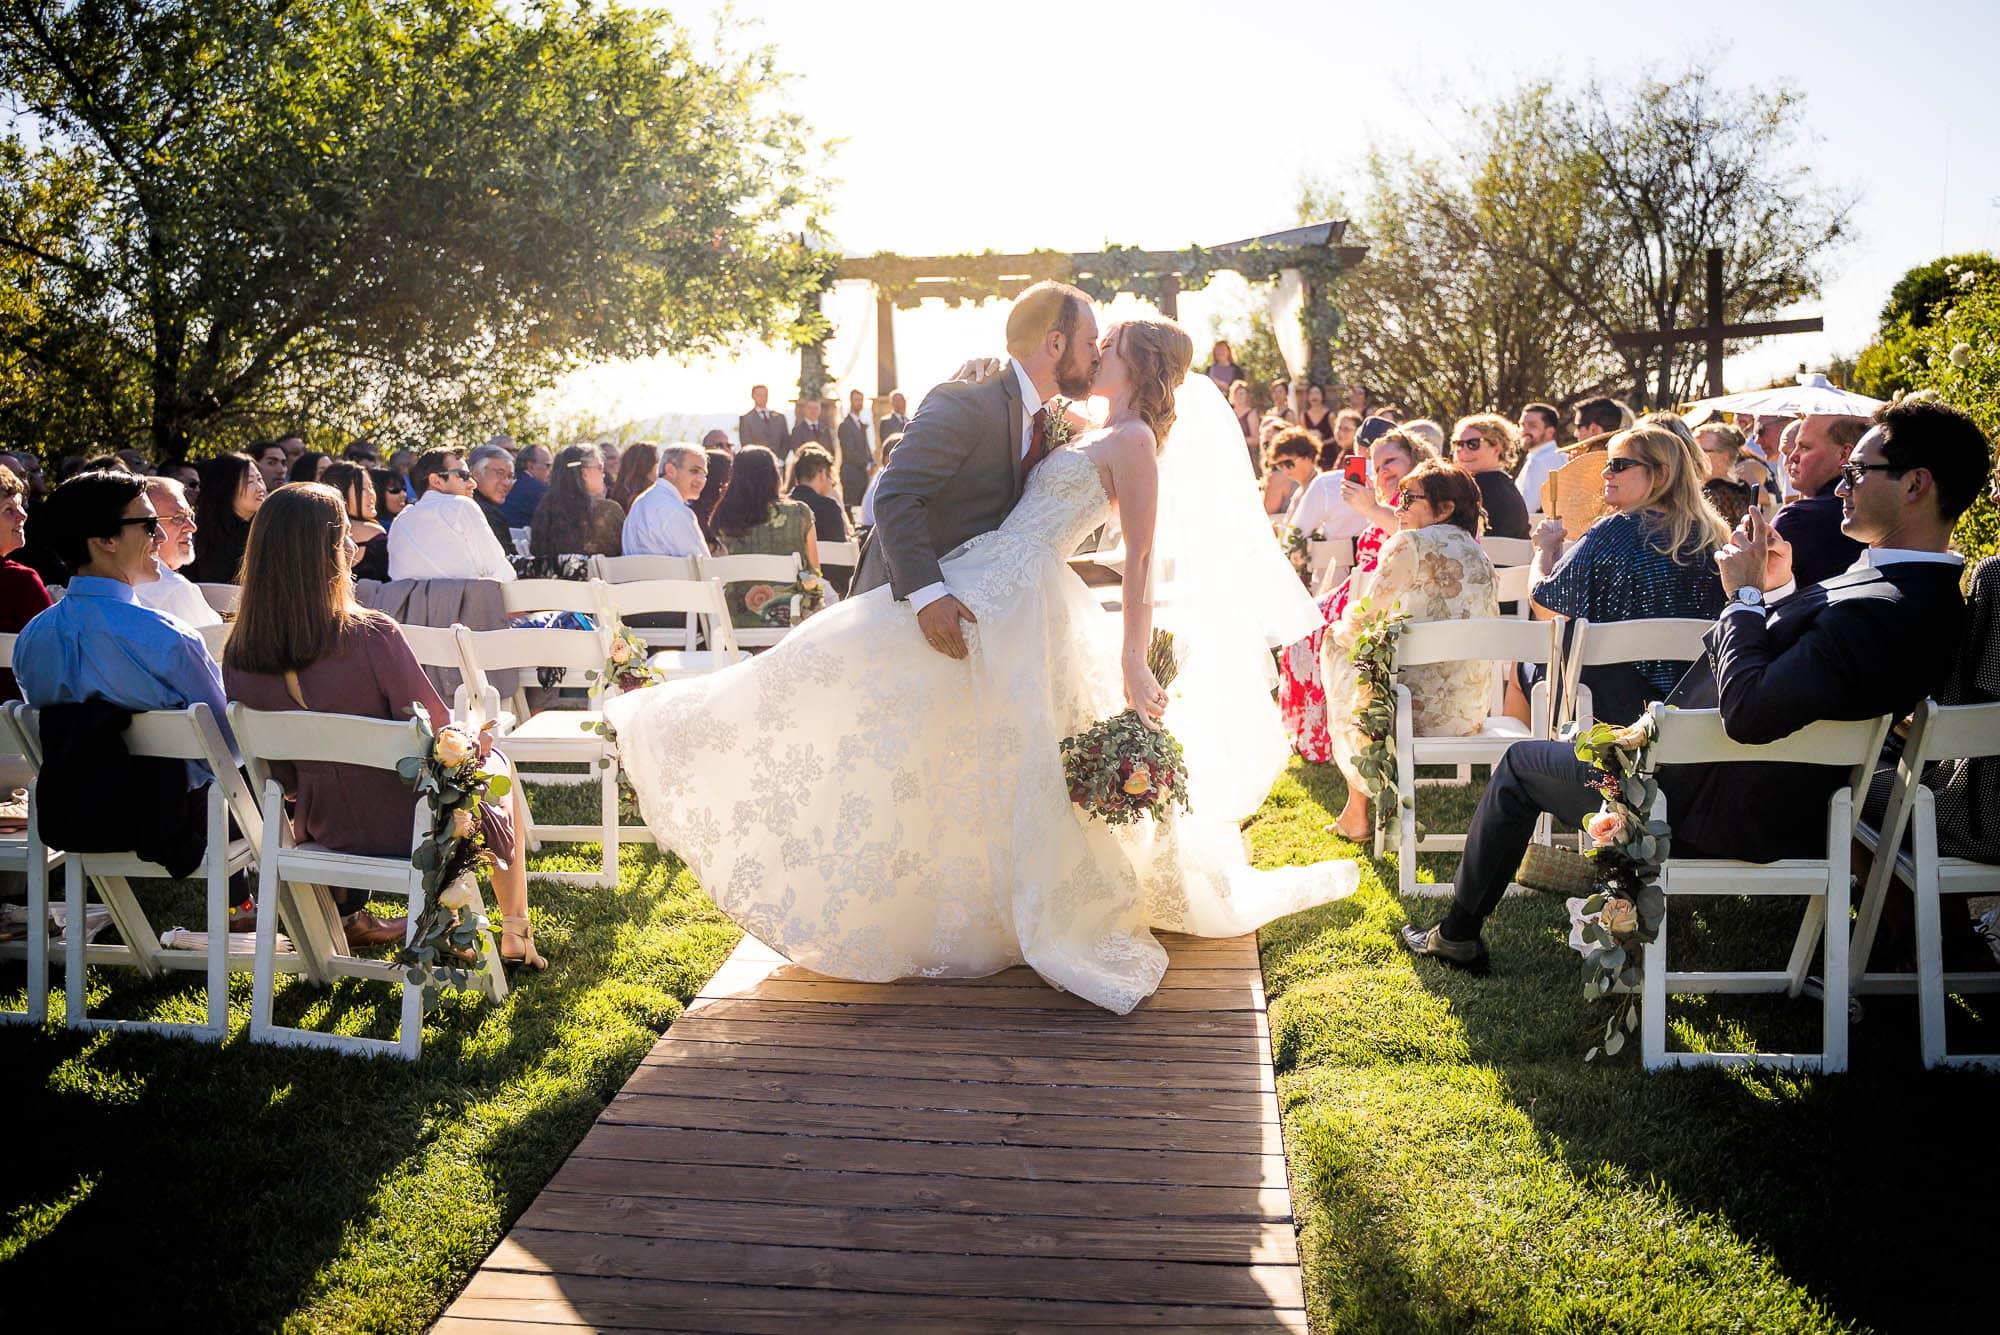 302_Alan_and_Heidi_Serendipity_Garden_Wedding_10-27-2018